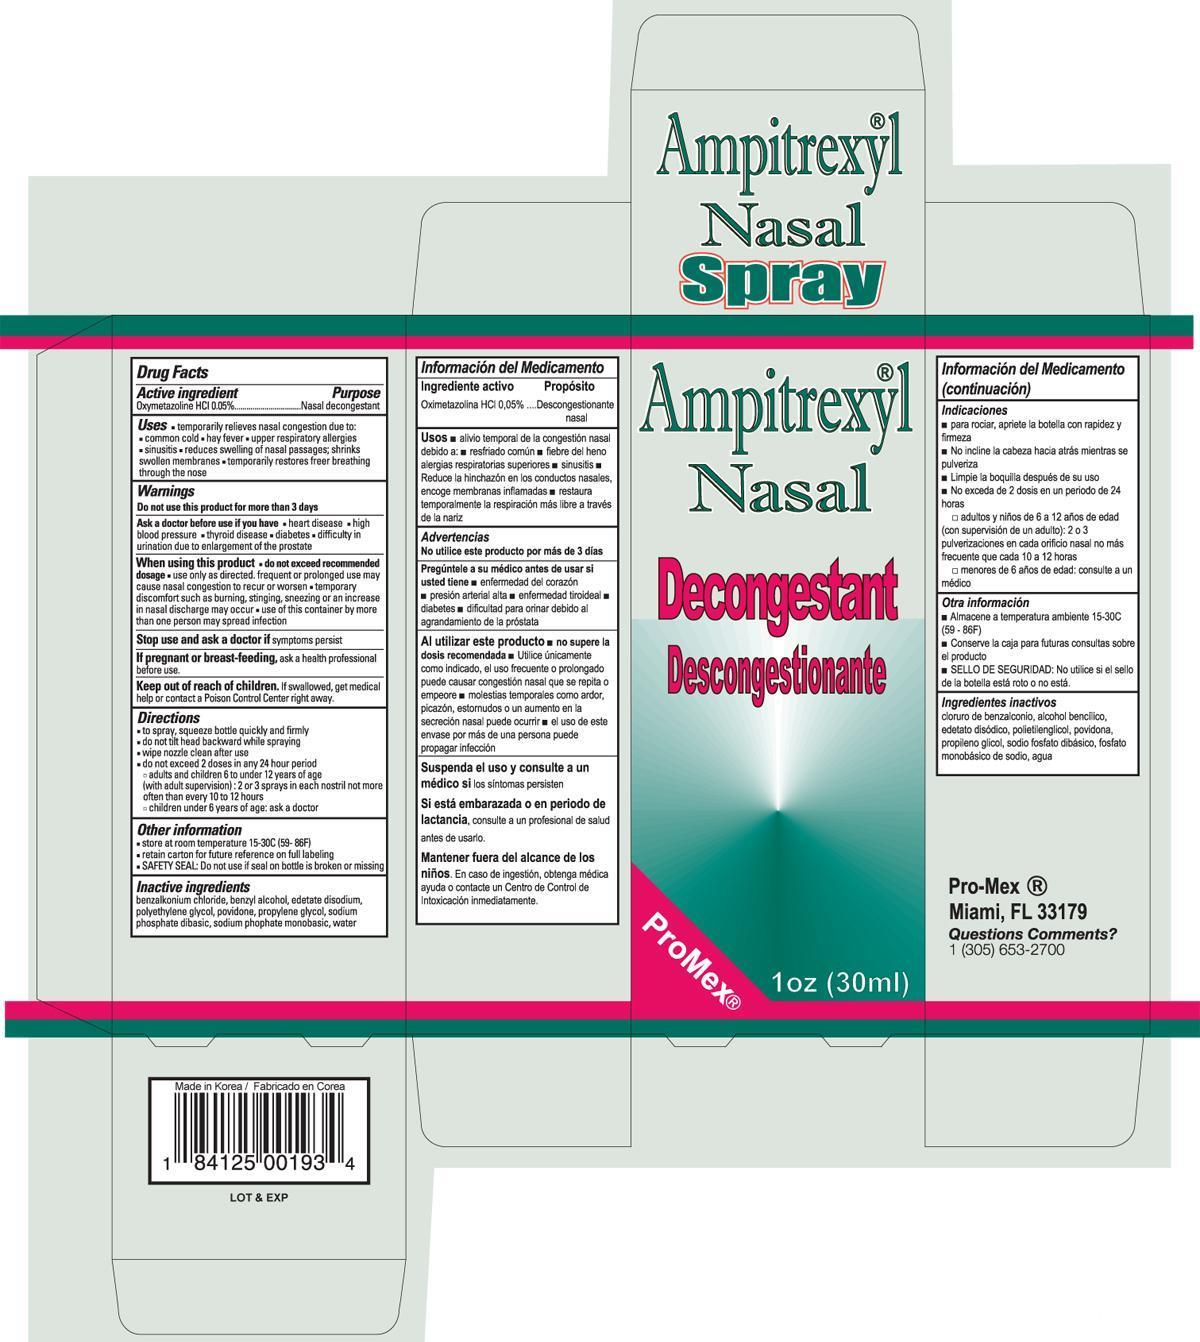 Nasal Decongestant (Oxymetazoline Hcl) Spray [Promex, Llc]